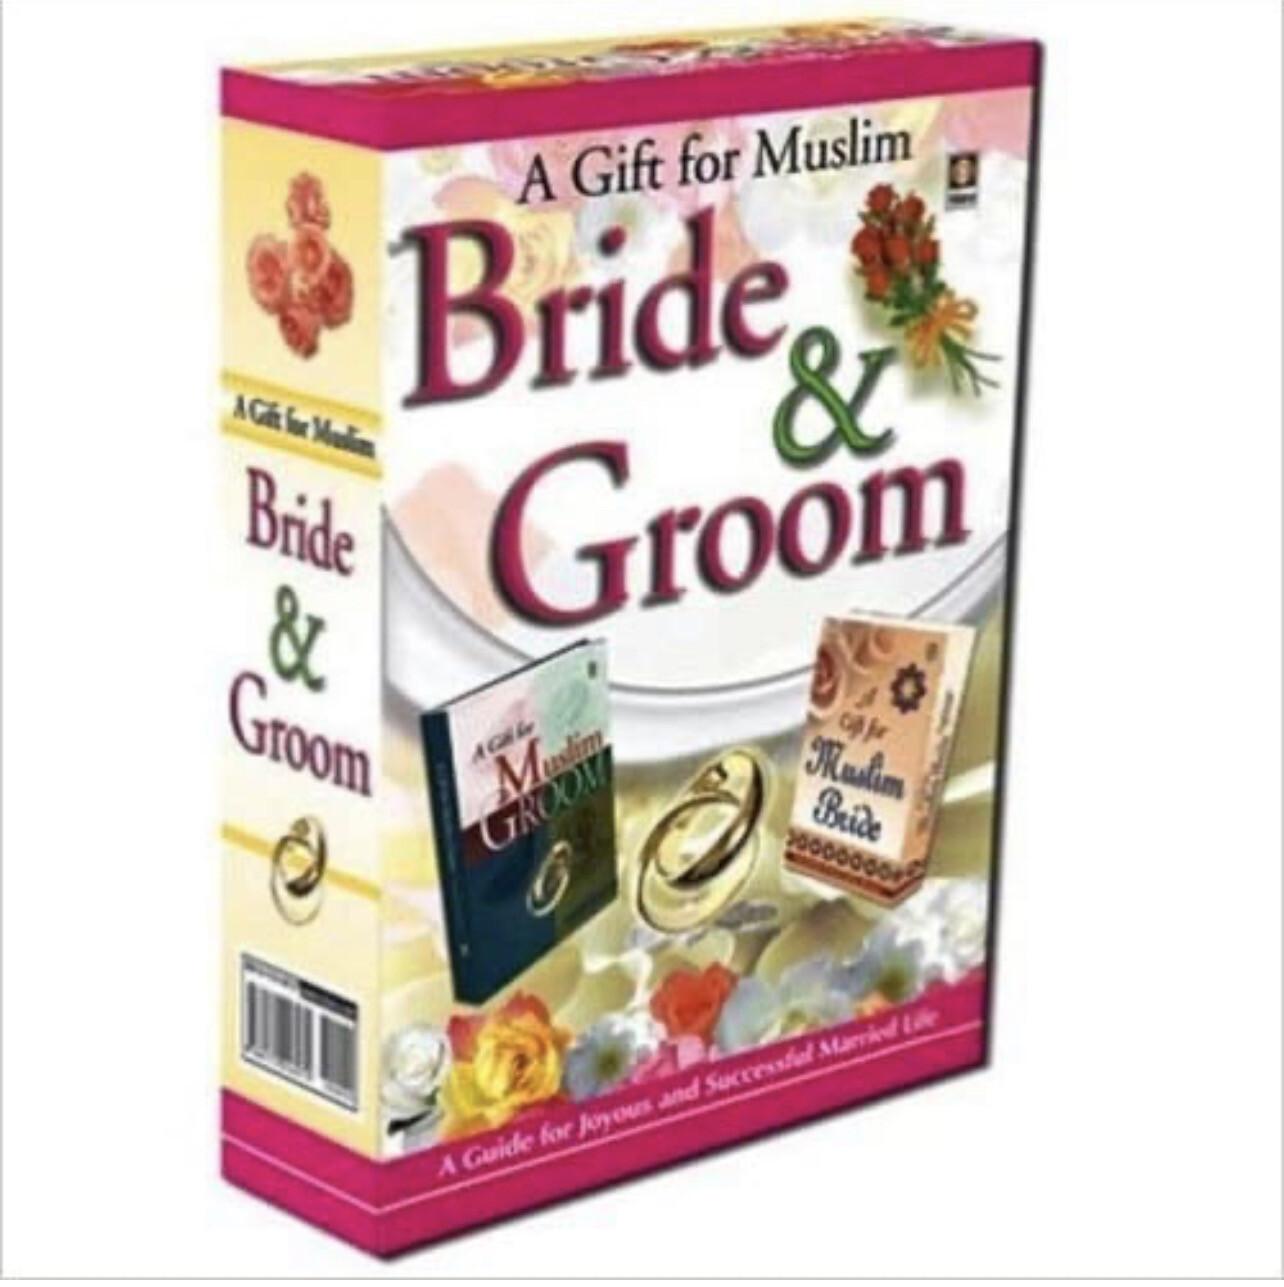 A Gift for Muslim Bride & Groom   Islamic Book